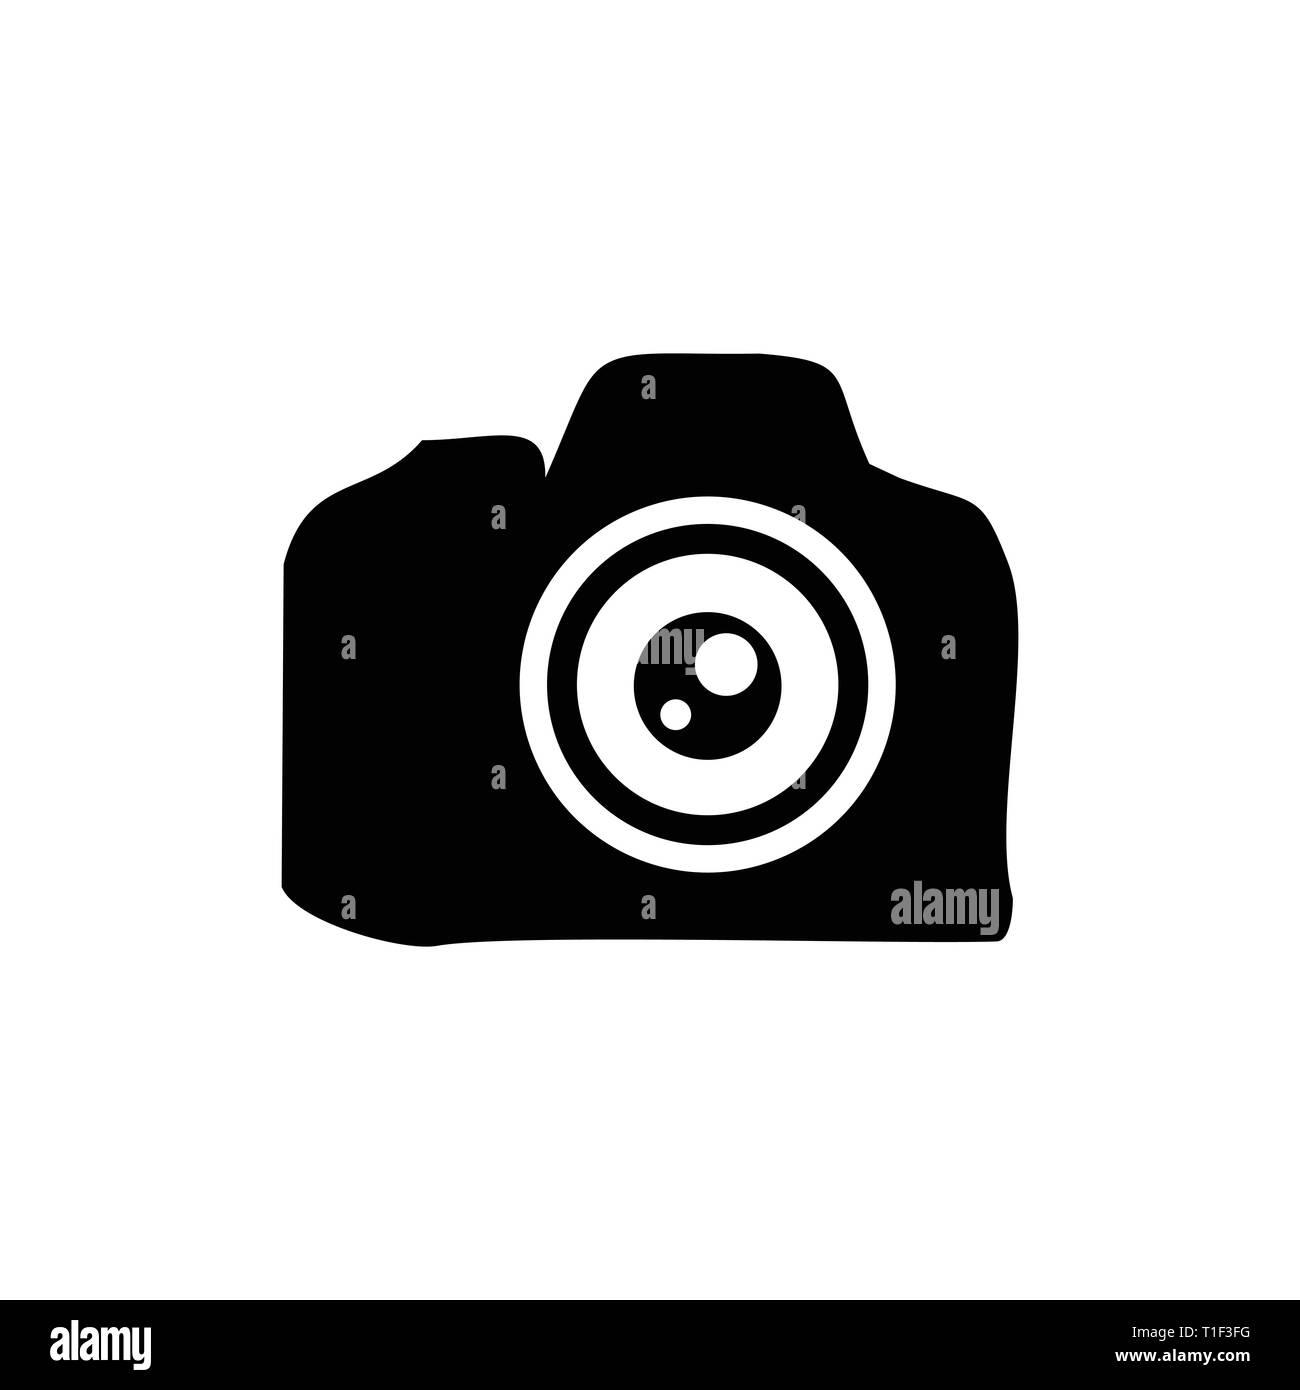 Camera Lens Professional Silhouette Vector Symbol Graphic Logo Design Template Stock Vector Image Art Alamy